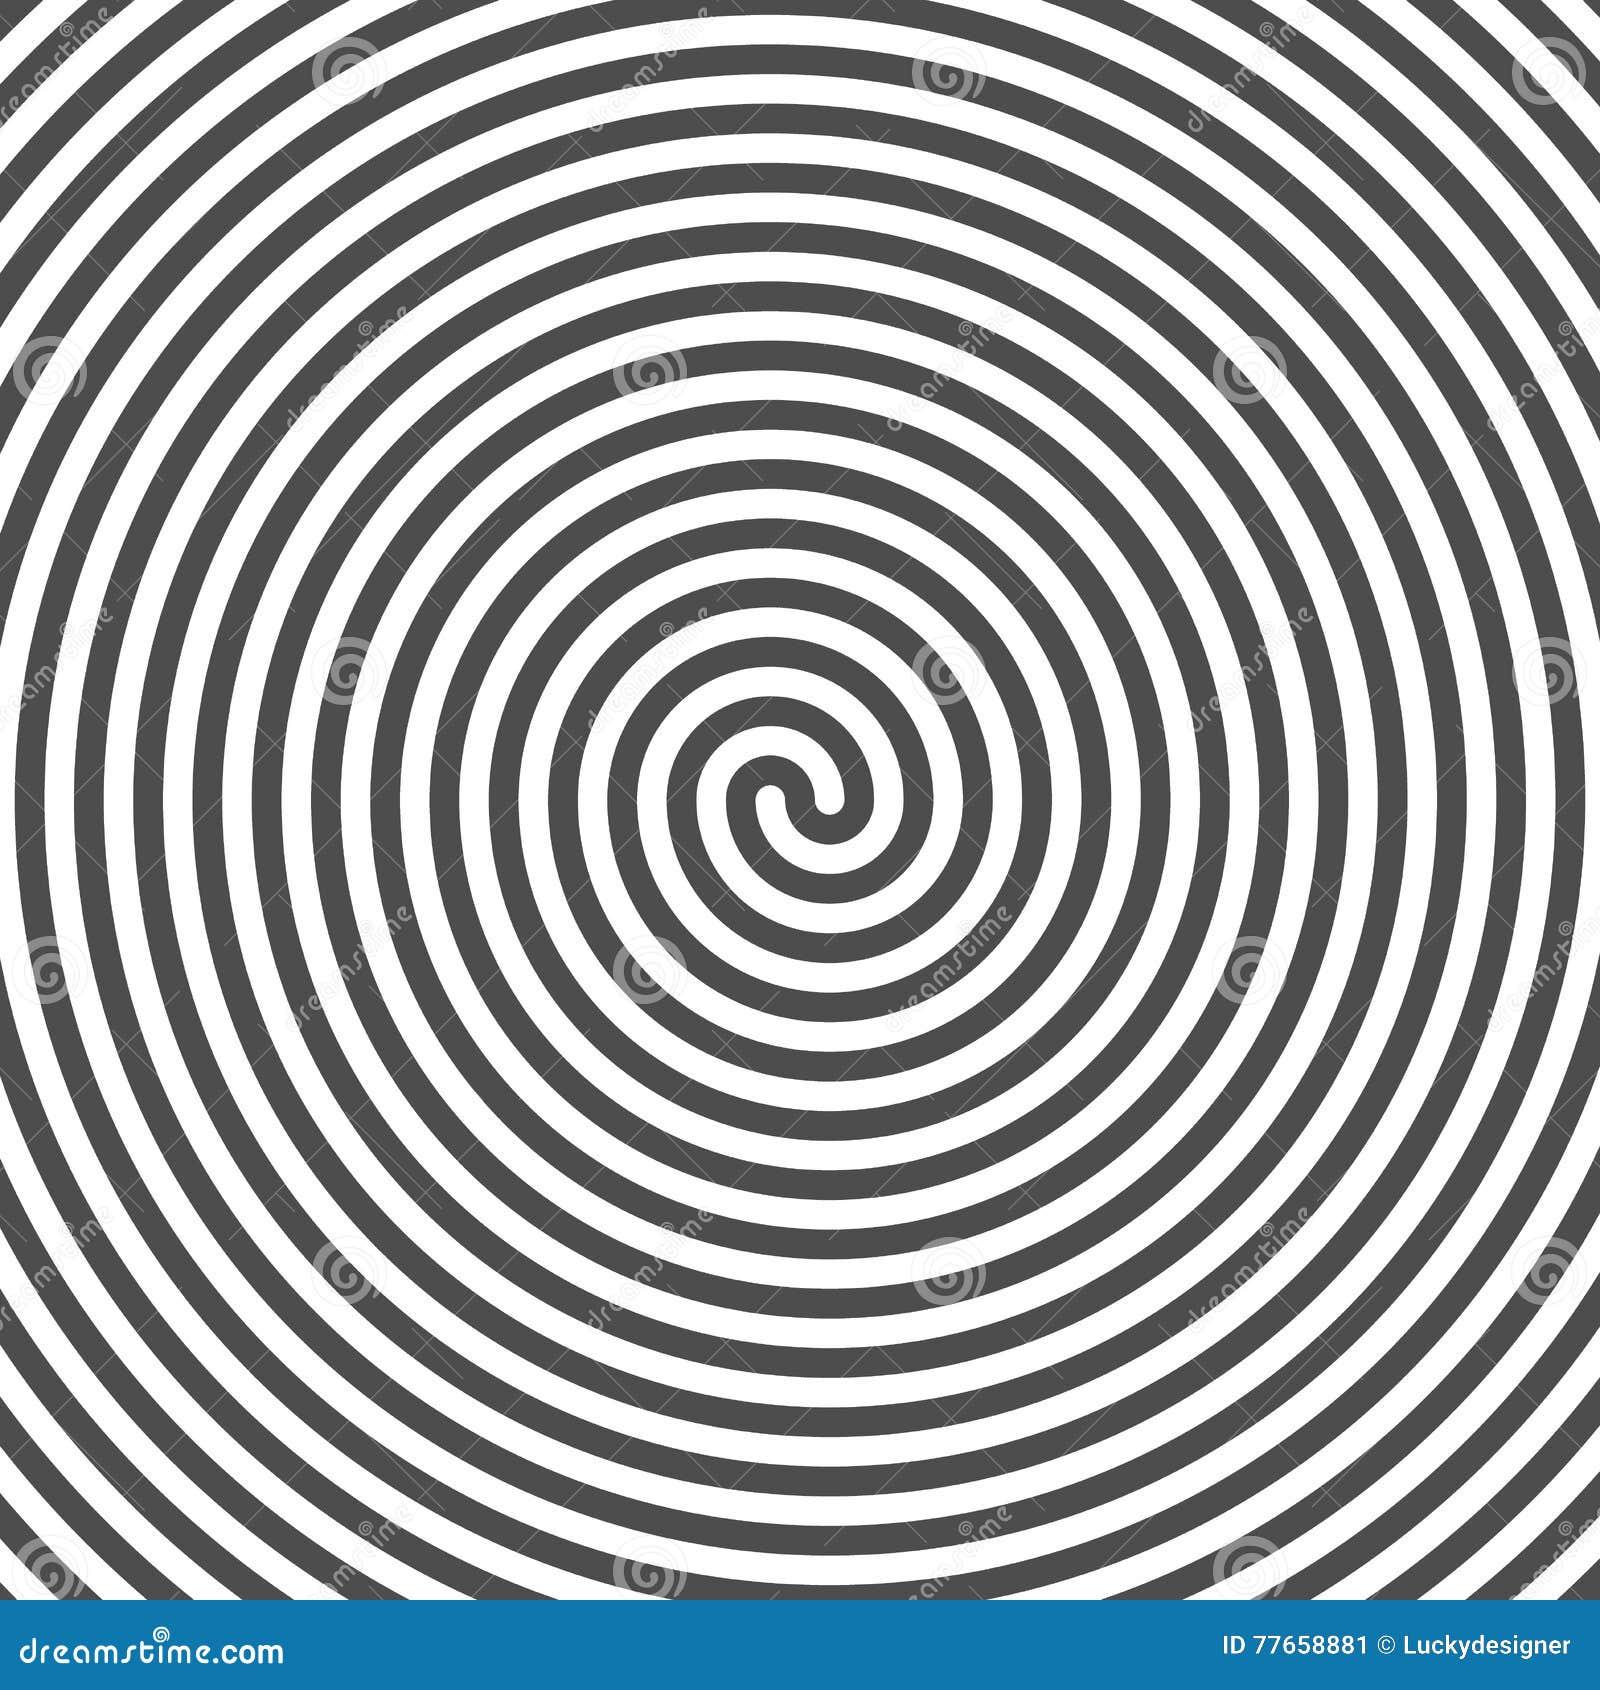 Hypnotic Spiral Background Vinyl Grooves Optical